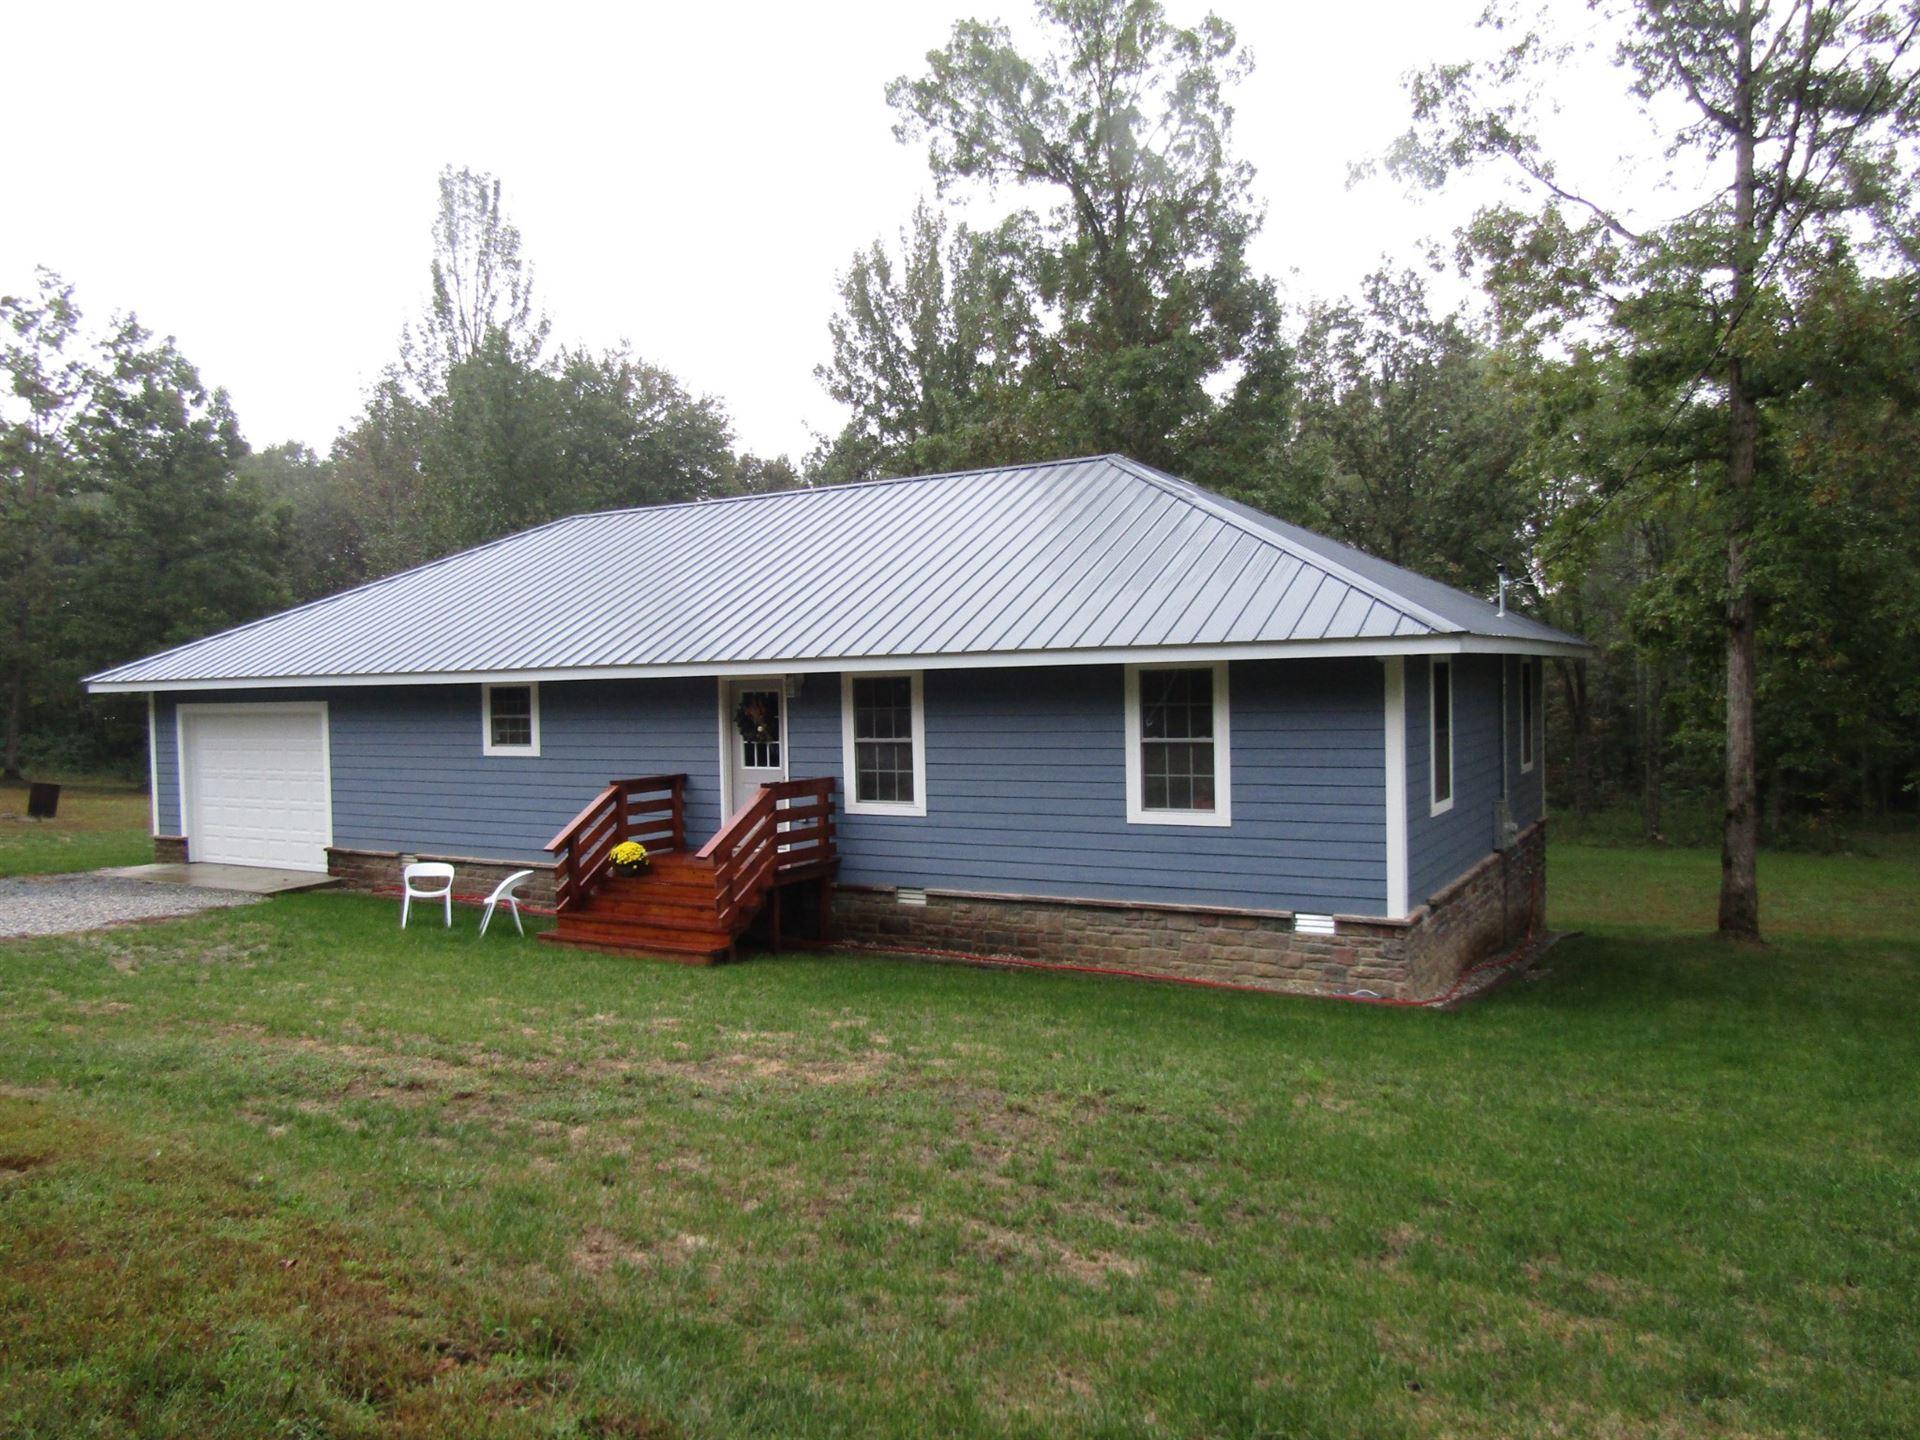 6640 Parish Dr, Nunnelly, TN 37137 - MLS#: 2297779